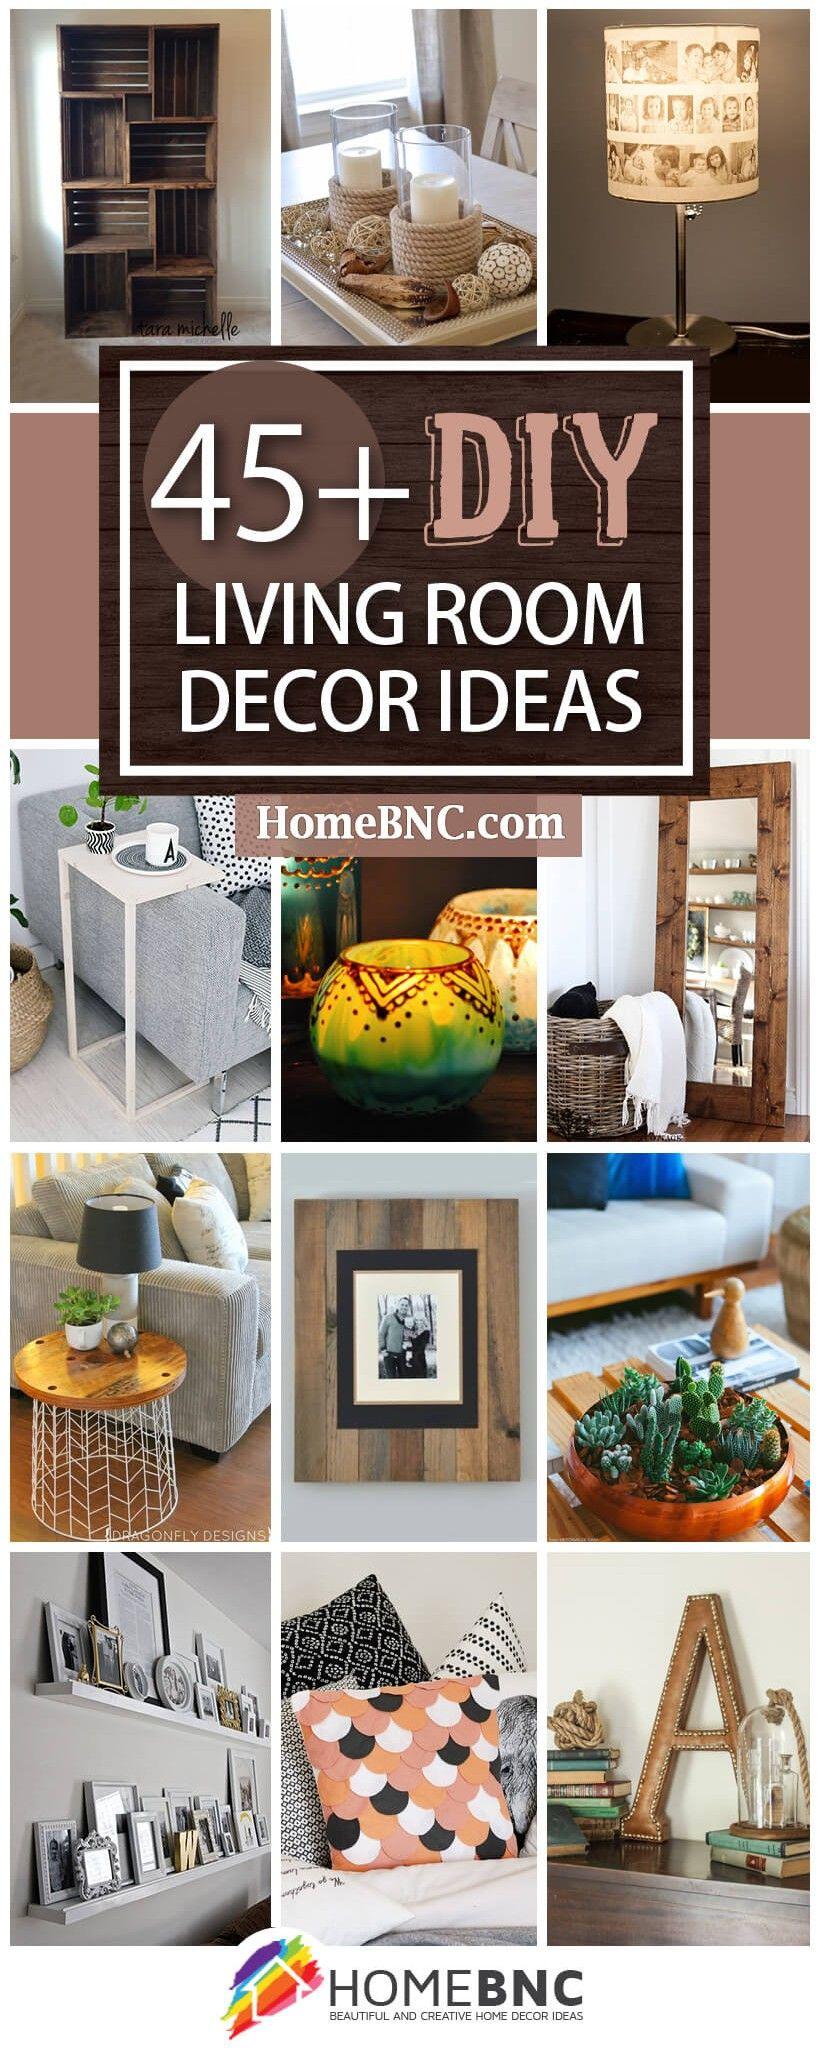 45 Inspiring Diy Living Room Decorating Ideas For Designers On A